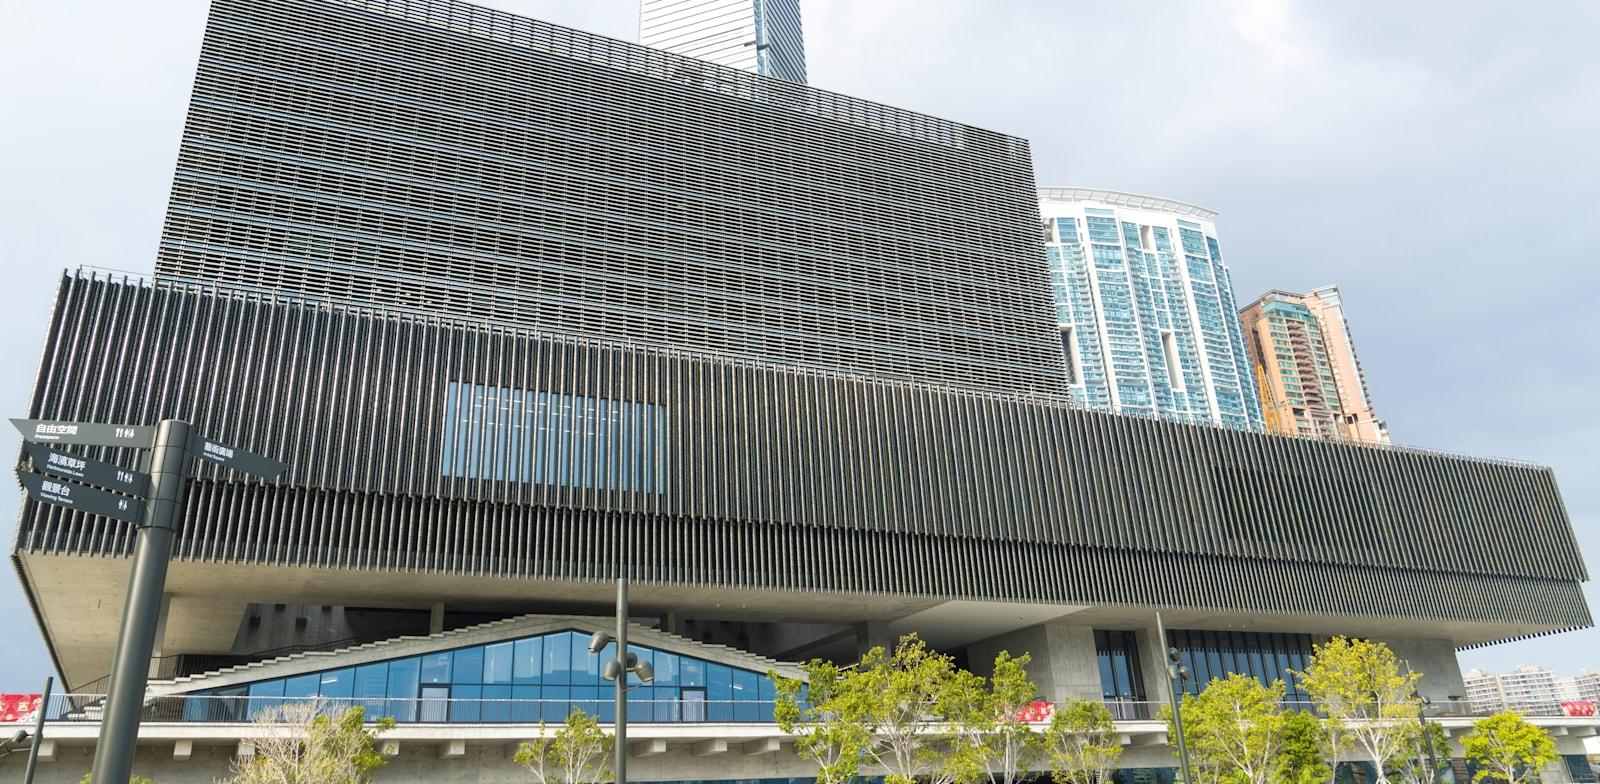 מוזיאון M+, הונג קונג / צילום: Shutterstock